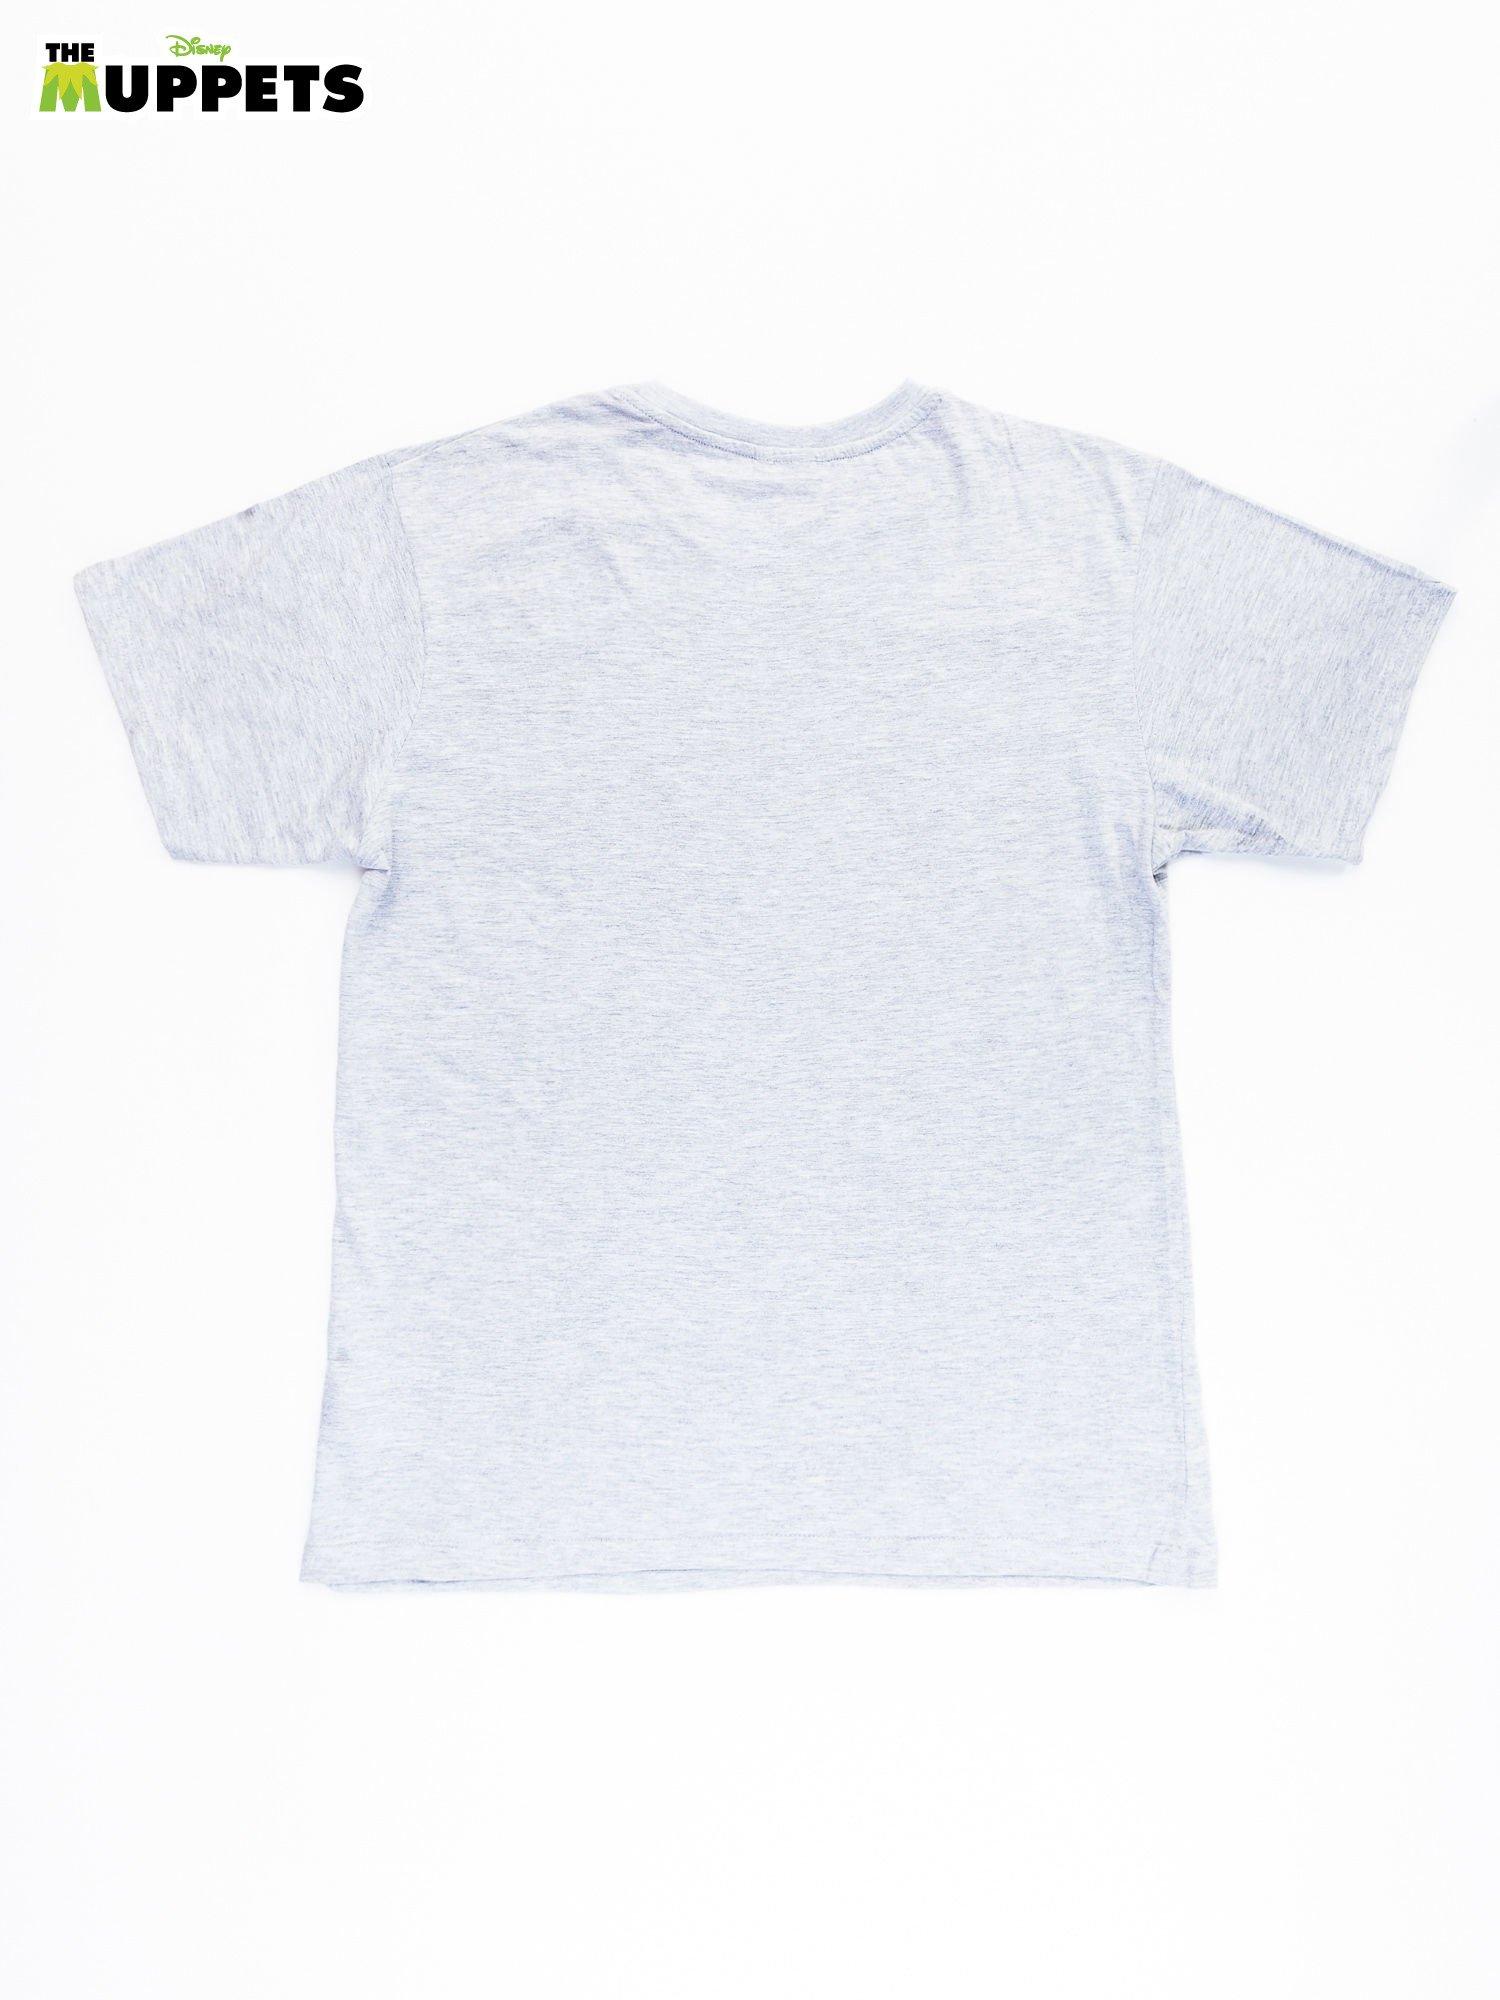 Szary t-shirt męski THE MUPPETS                                  zdj.                                  2